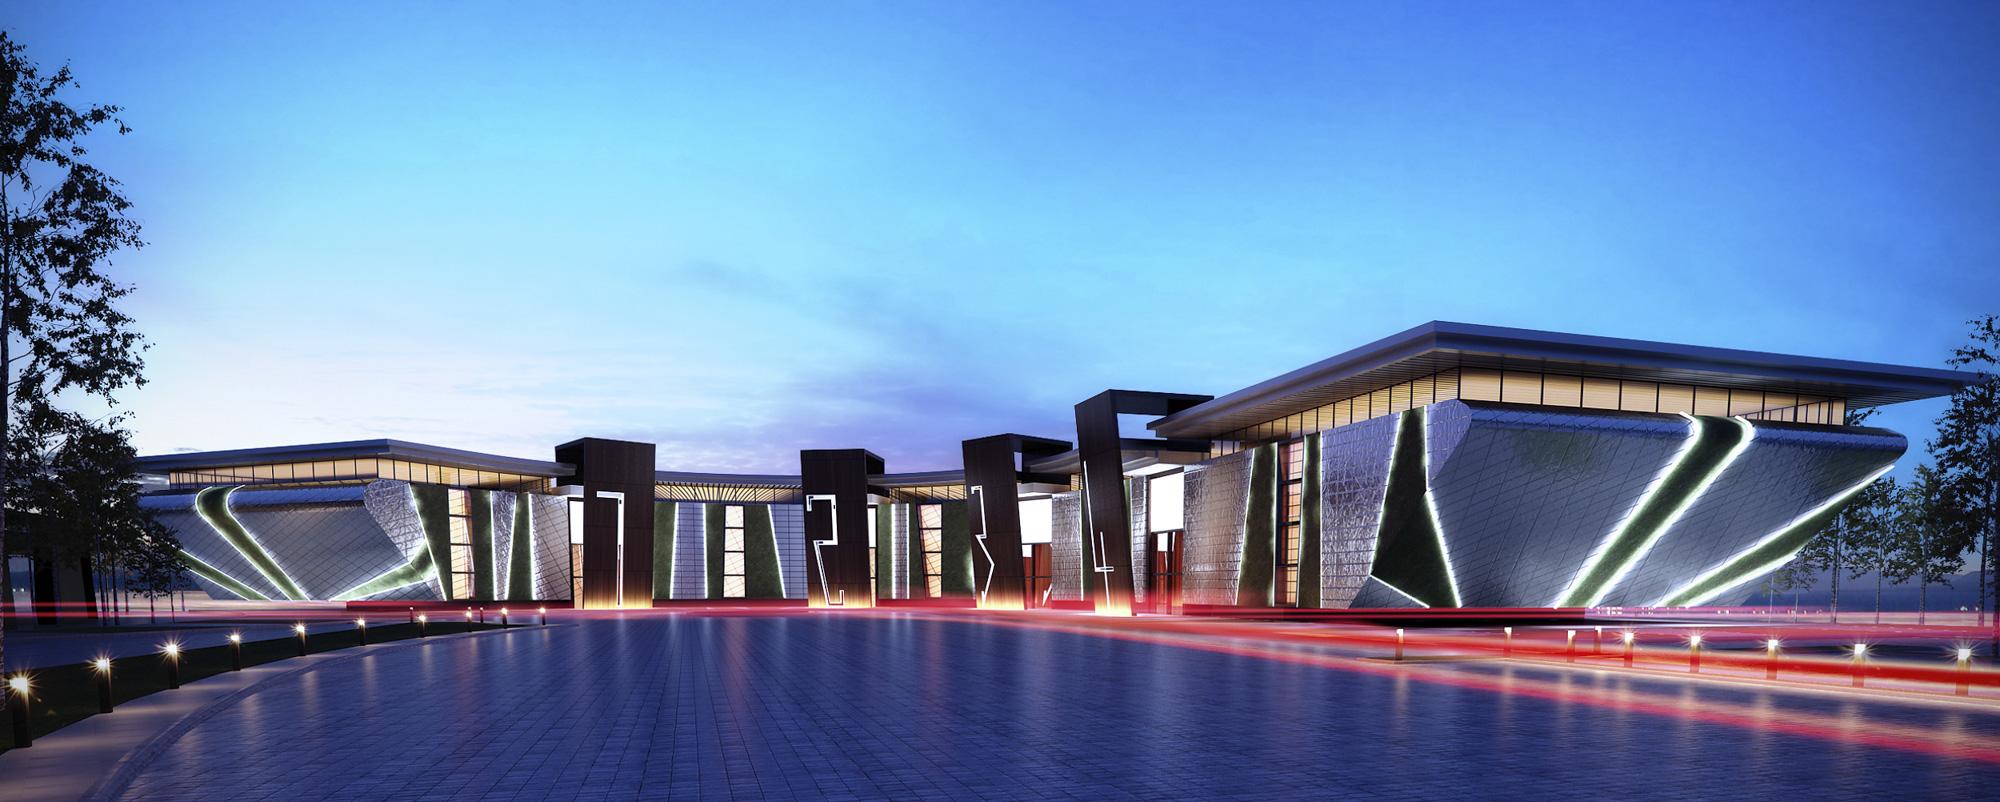 Song Hau Resort Exterior 5 Multipurpose Hall